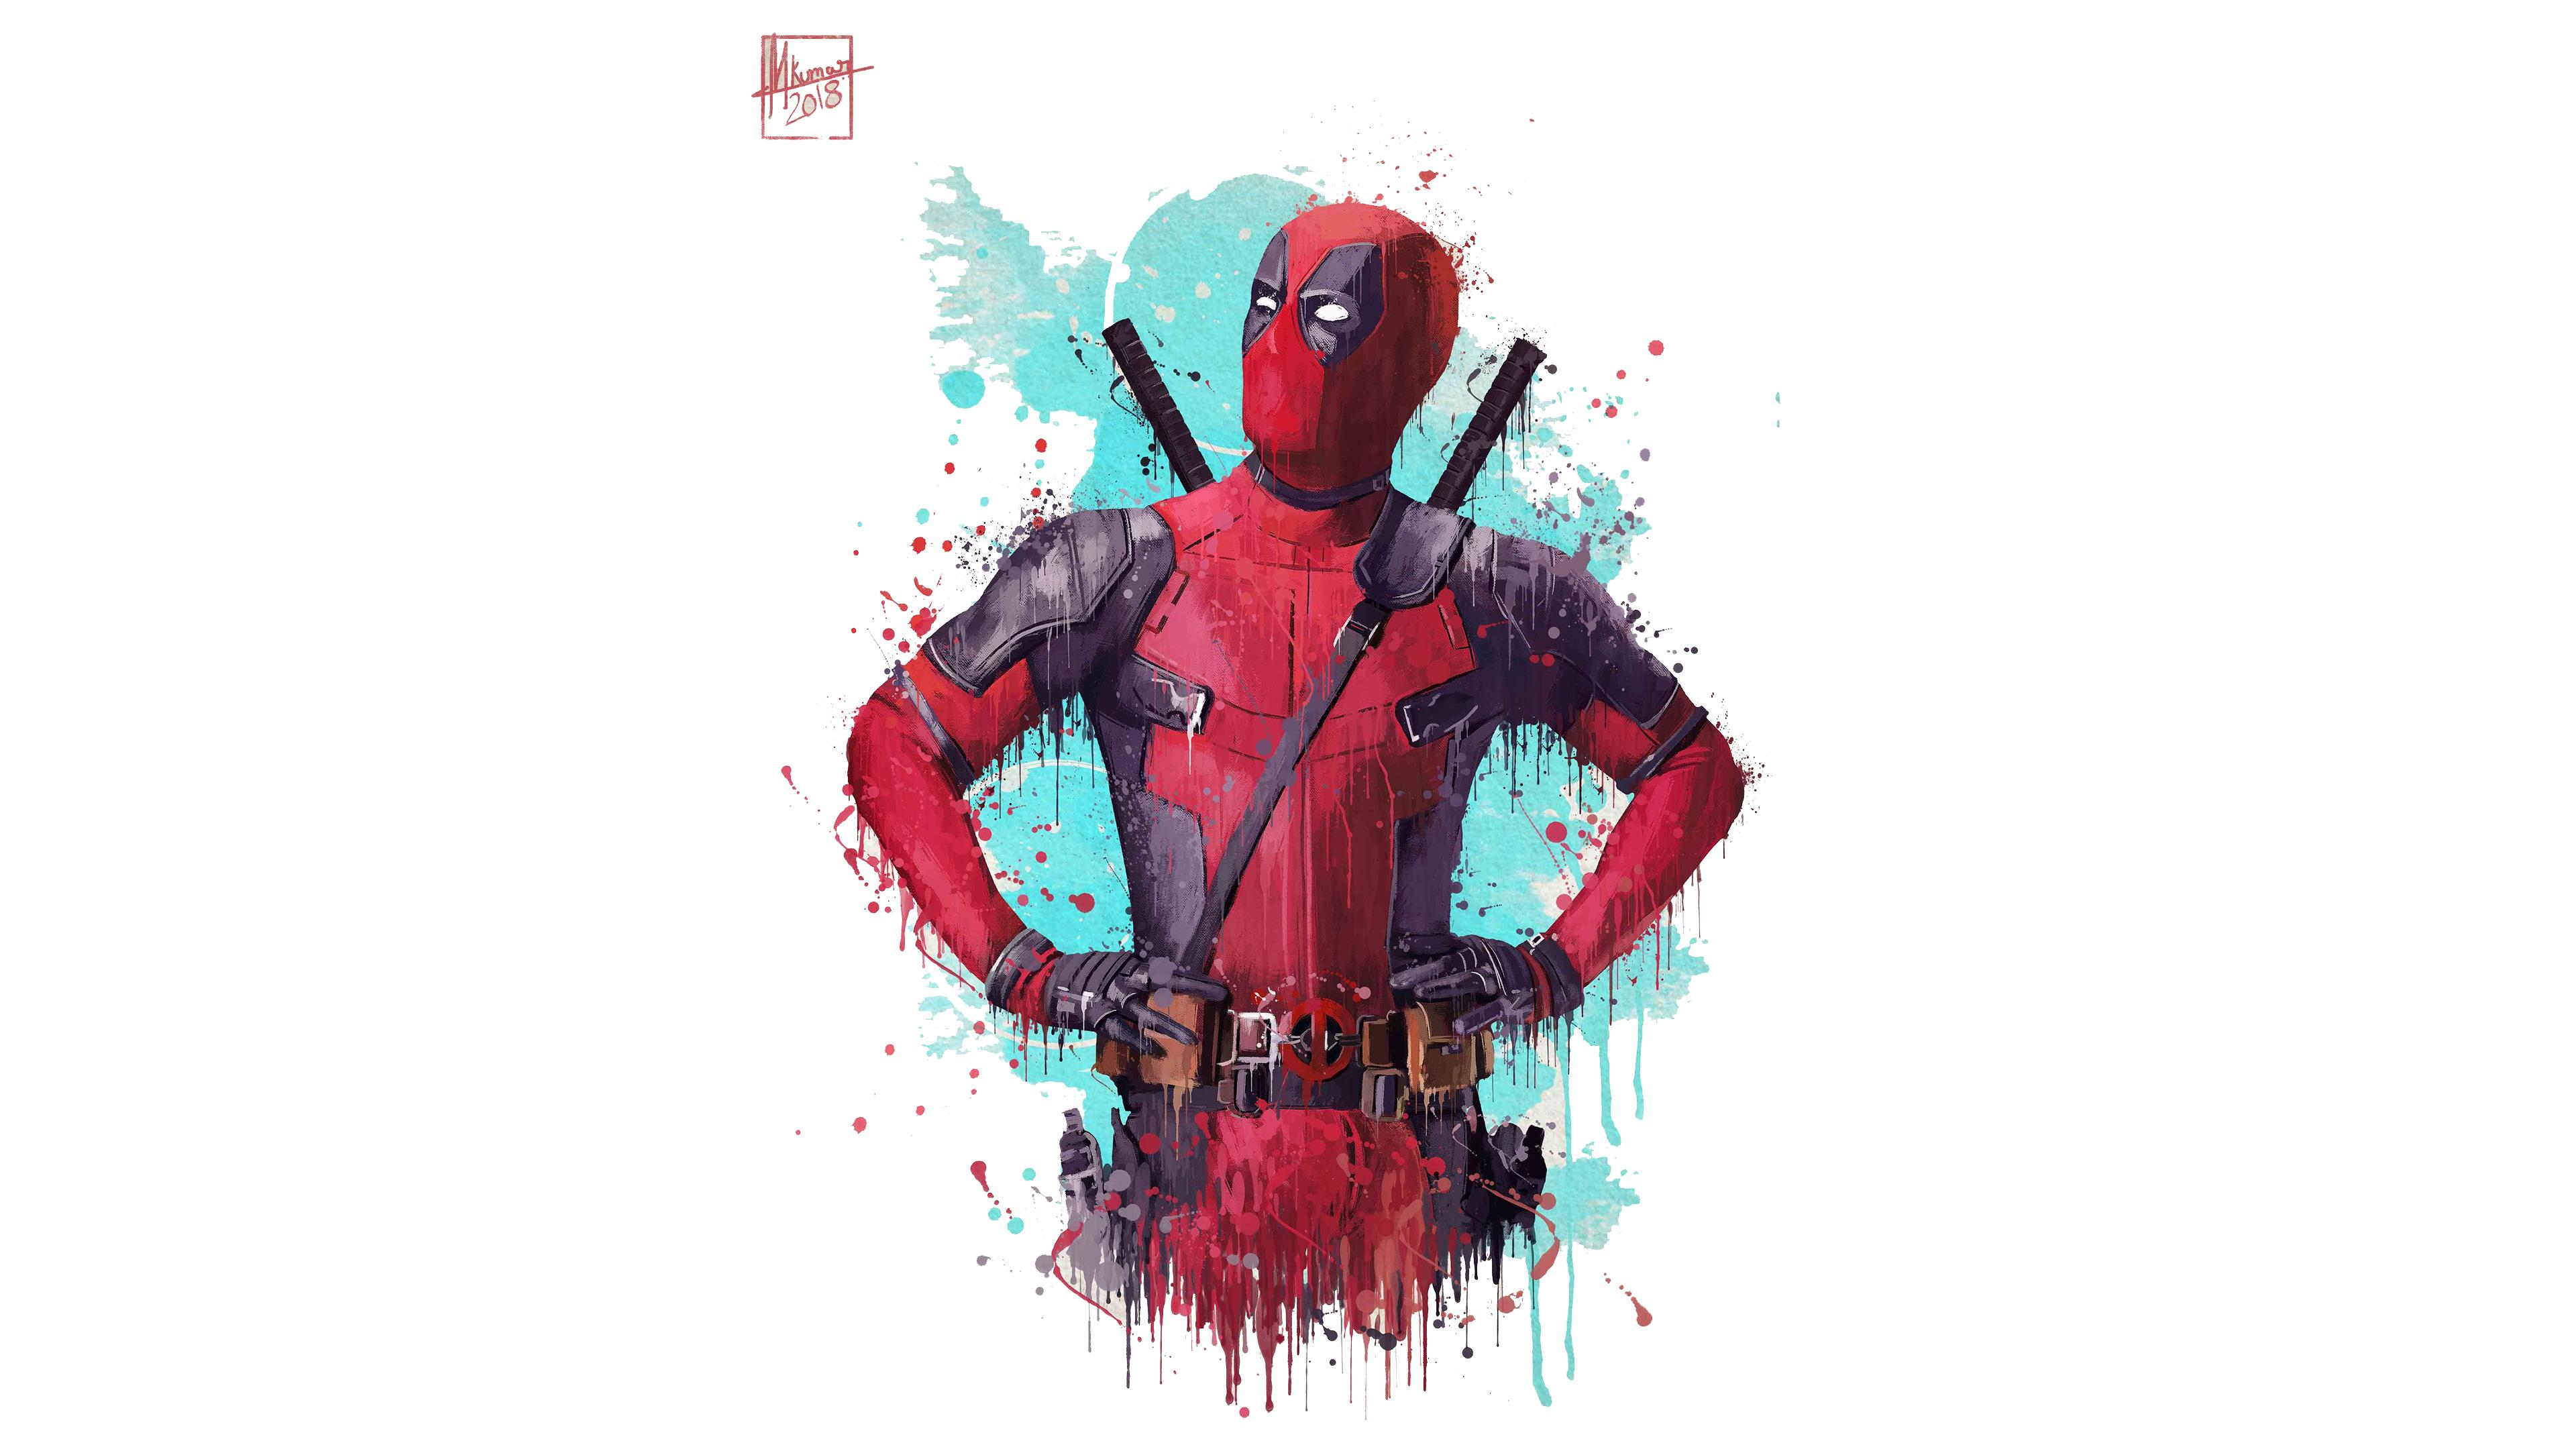 Deadpool 2 Artwork 4k Deadpool 2 Wallpaper 4k 2966509 Hd Wallpaper Backgrounds Download